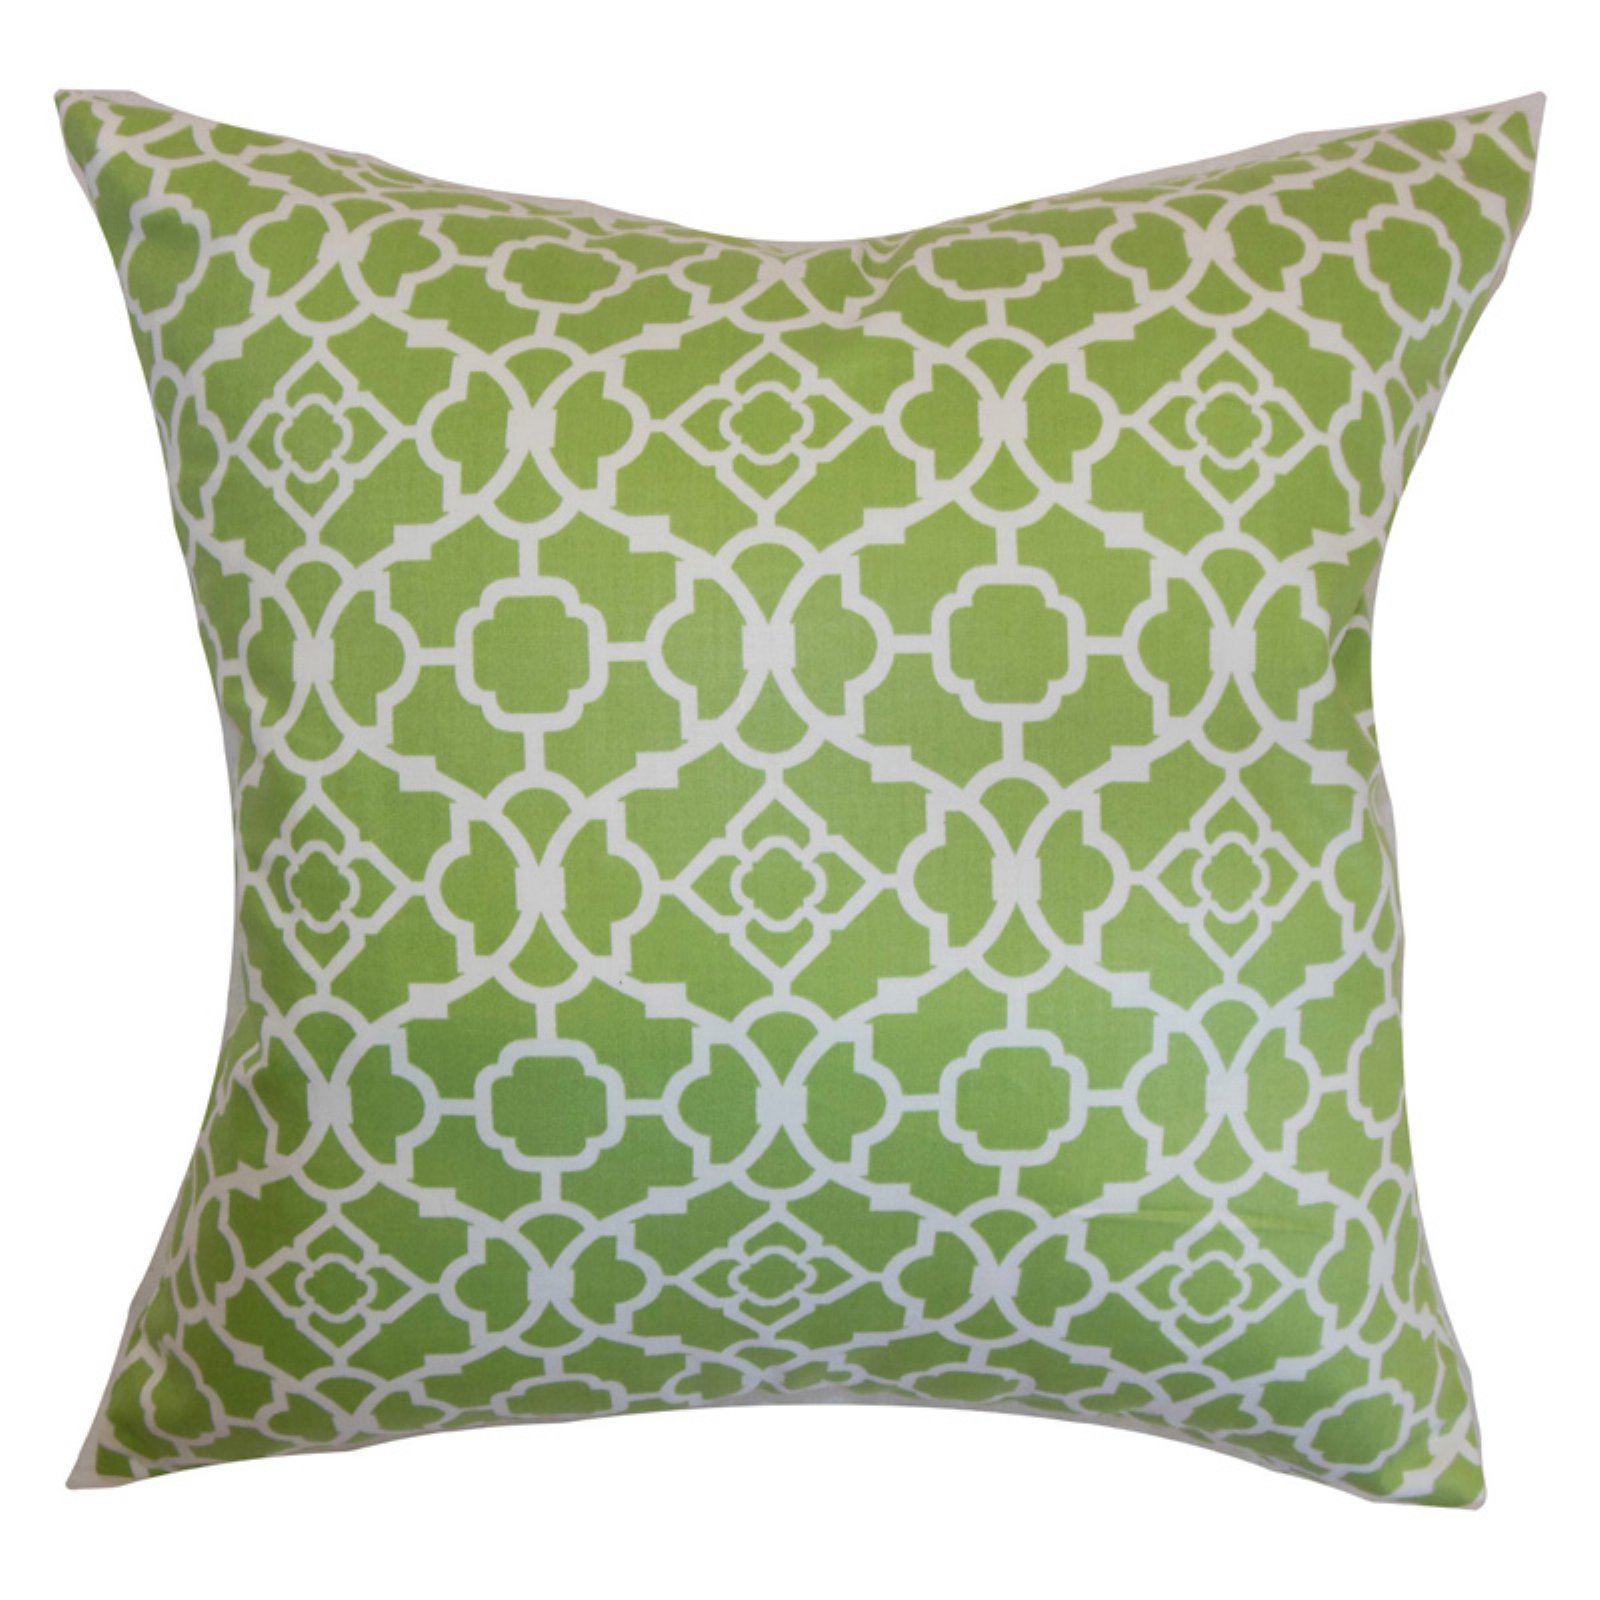 The Pillow Collection Kalmara Geometric Pillow